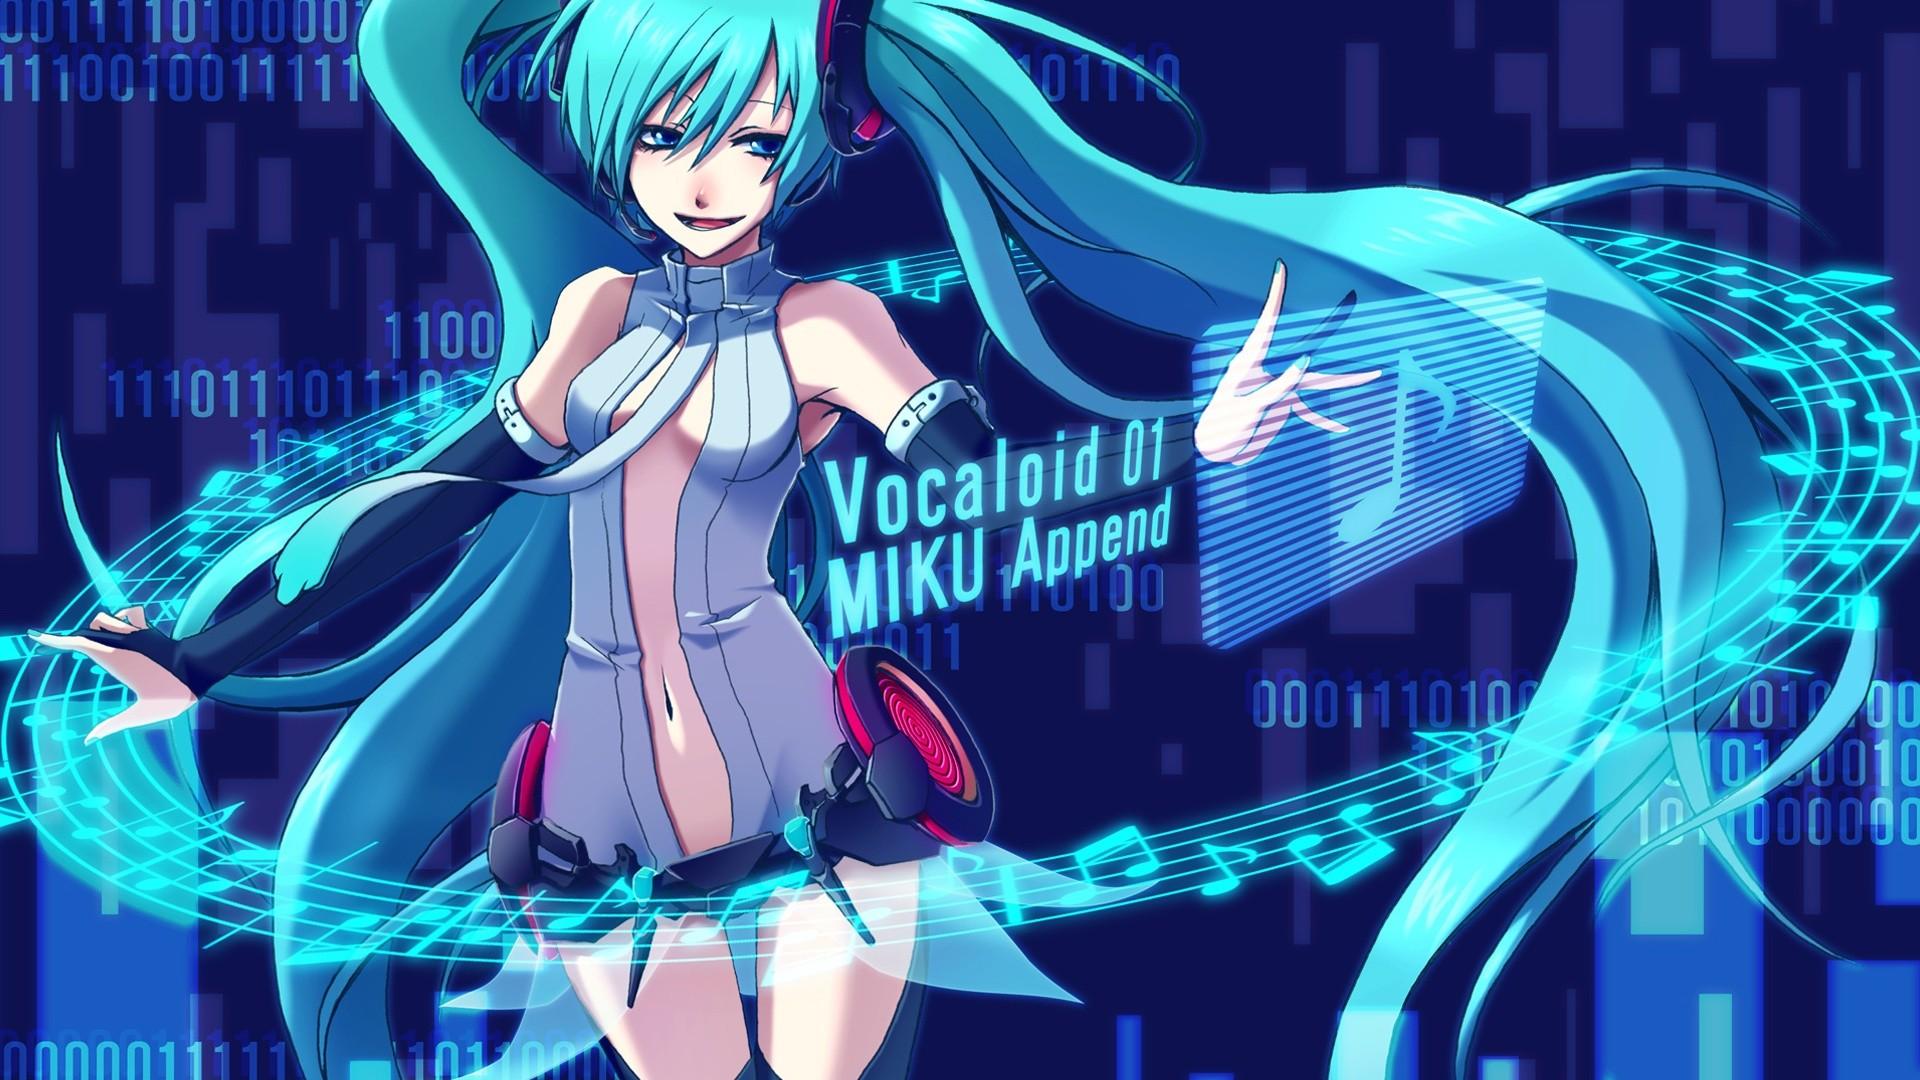 Hatsune Miku, Musik, blauen Haaren anime girl, Miku Append  Hintergrundbilder – Full